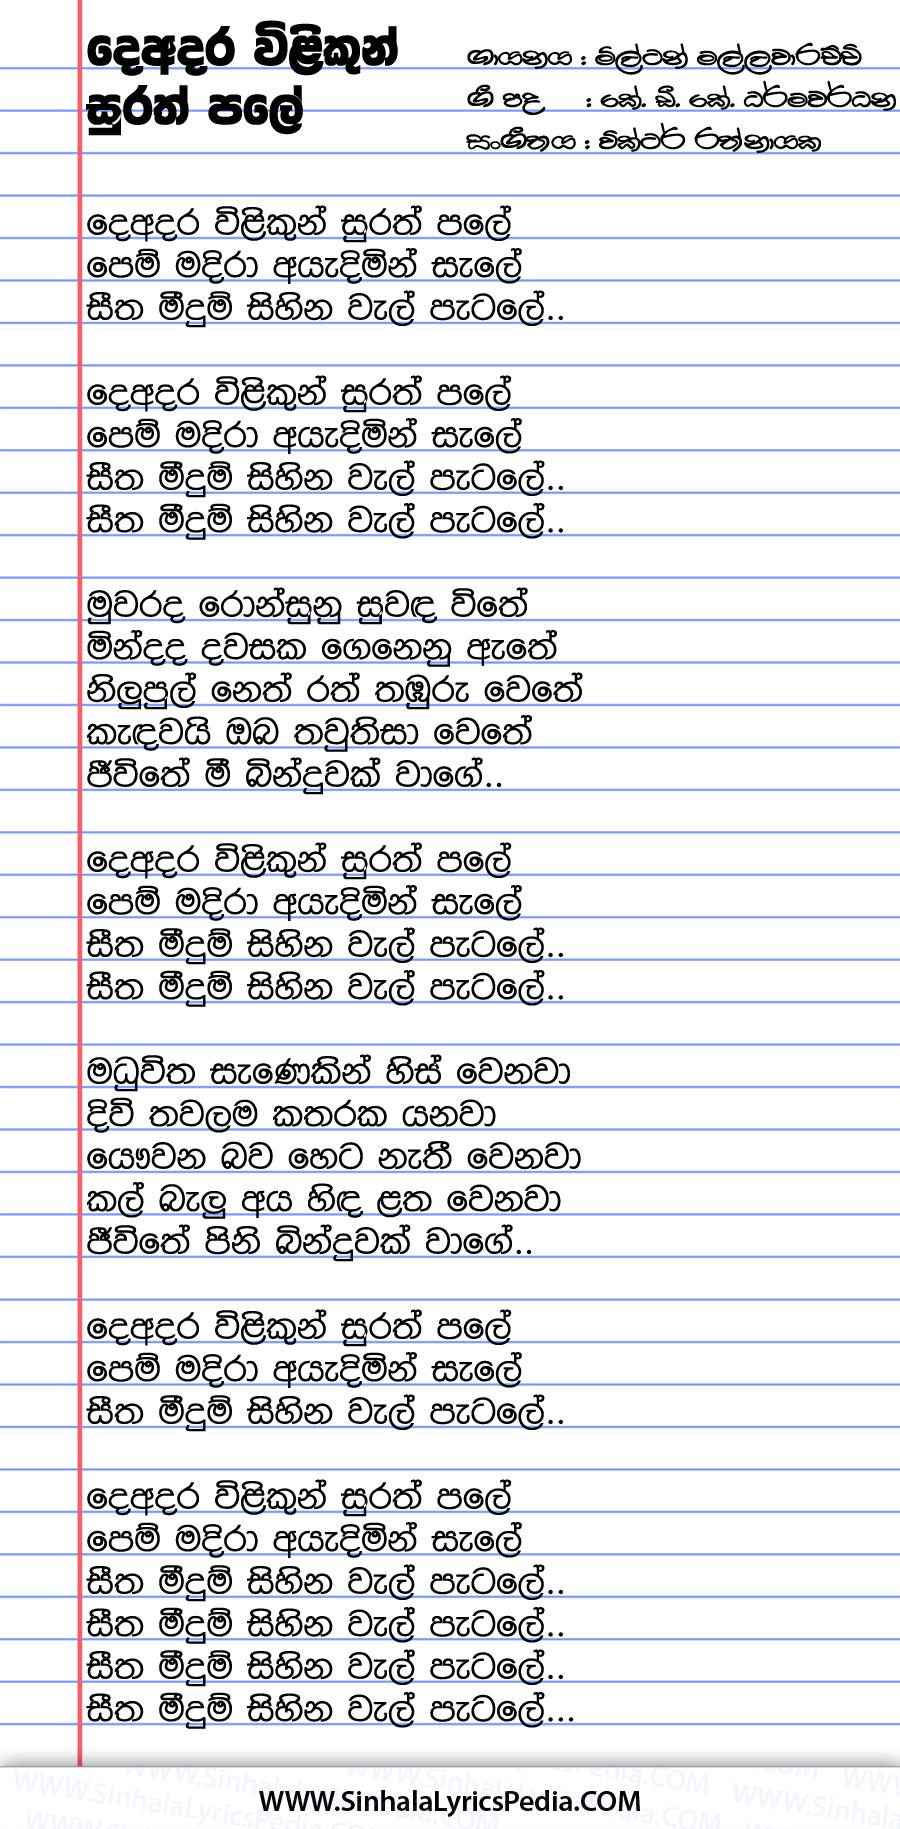 Deadara Wilikun Surath Pale Song Lyrics